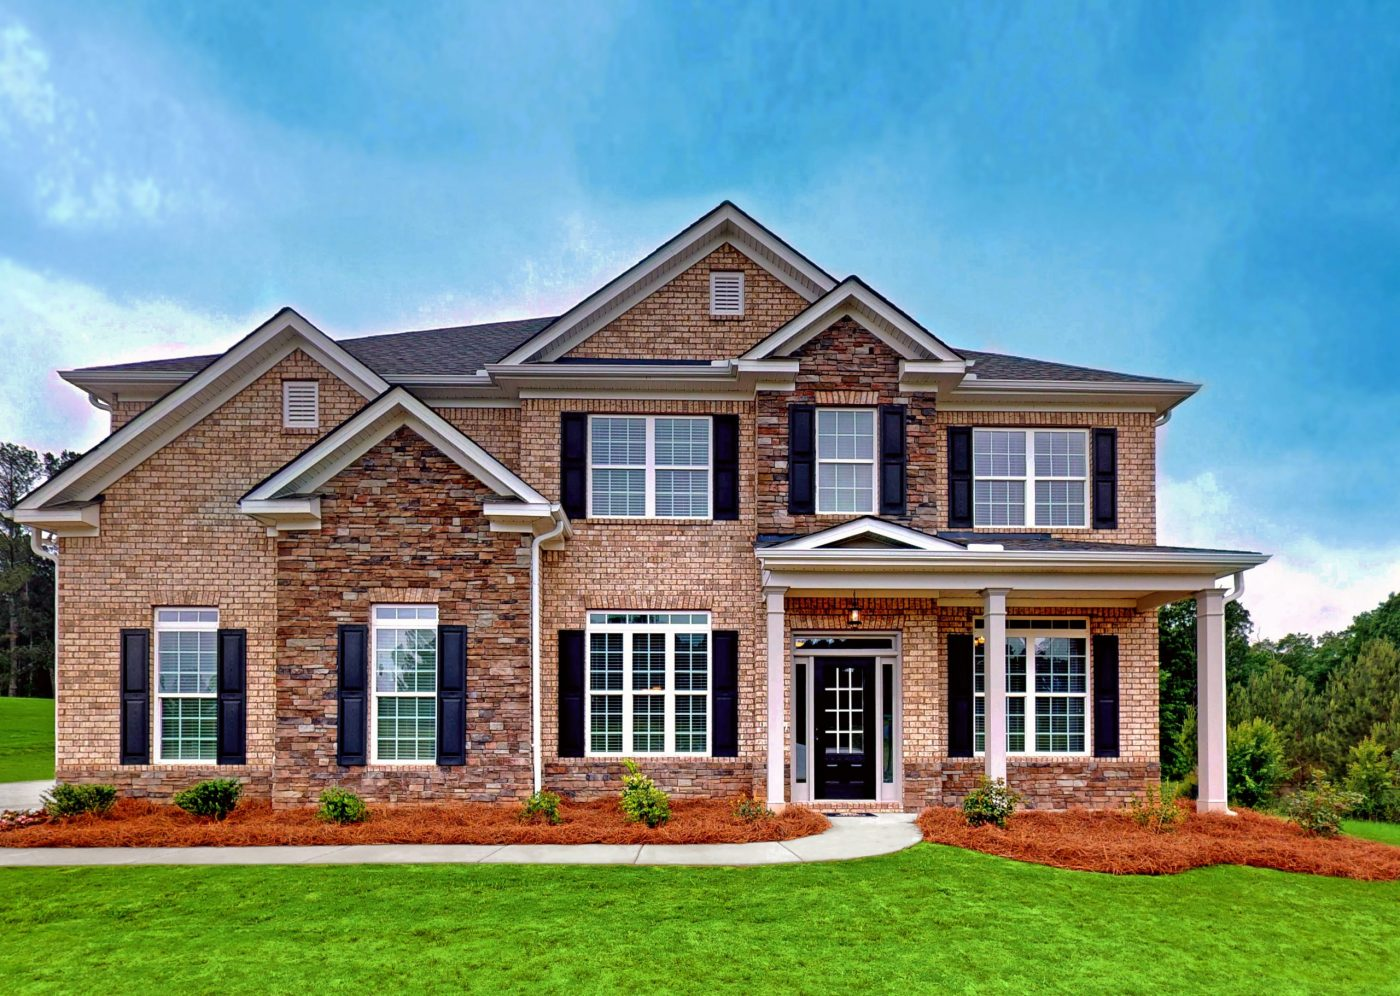 a home in a silverstone communities neighborhood